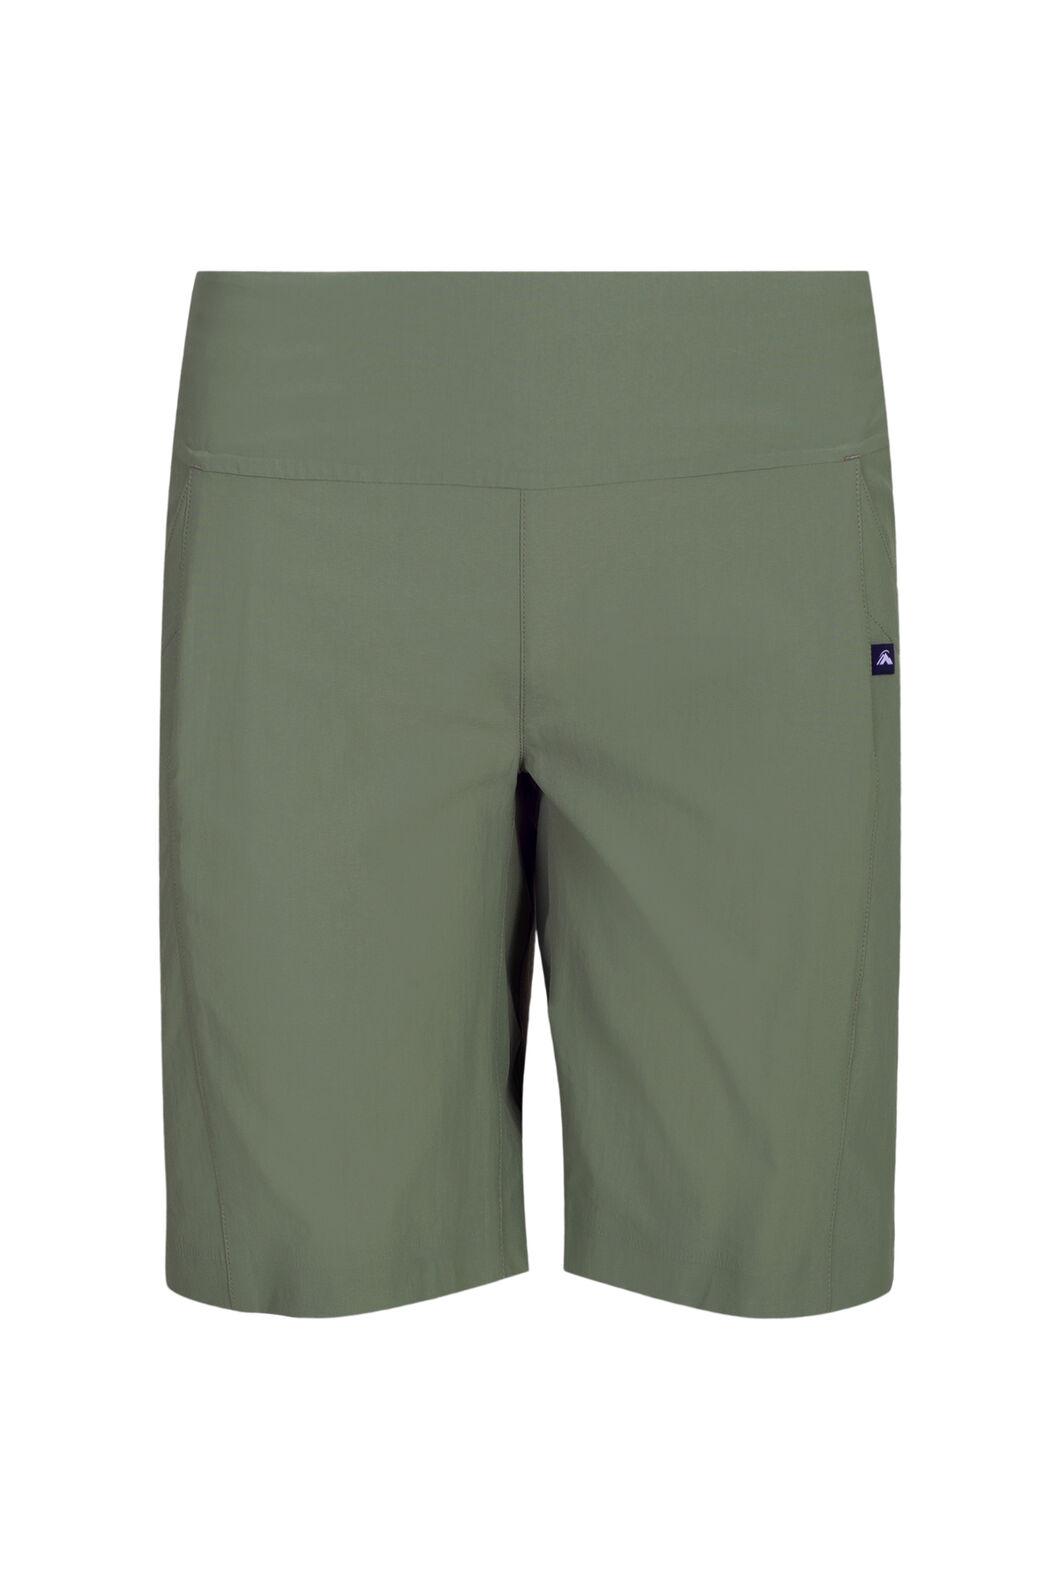 Macpac Boulder Shorts — Women's, Deep Lichen Green, hi-res